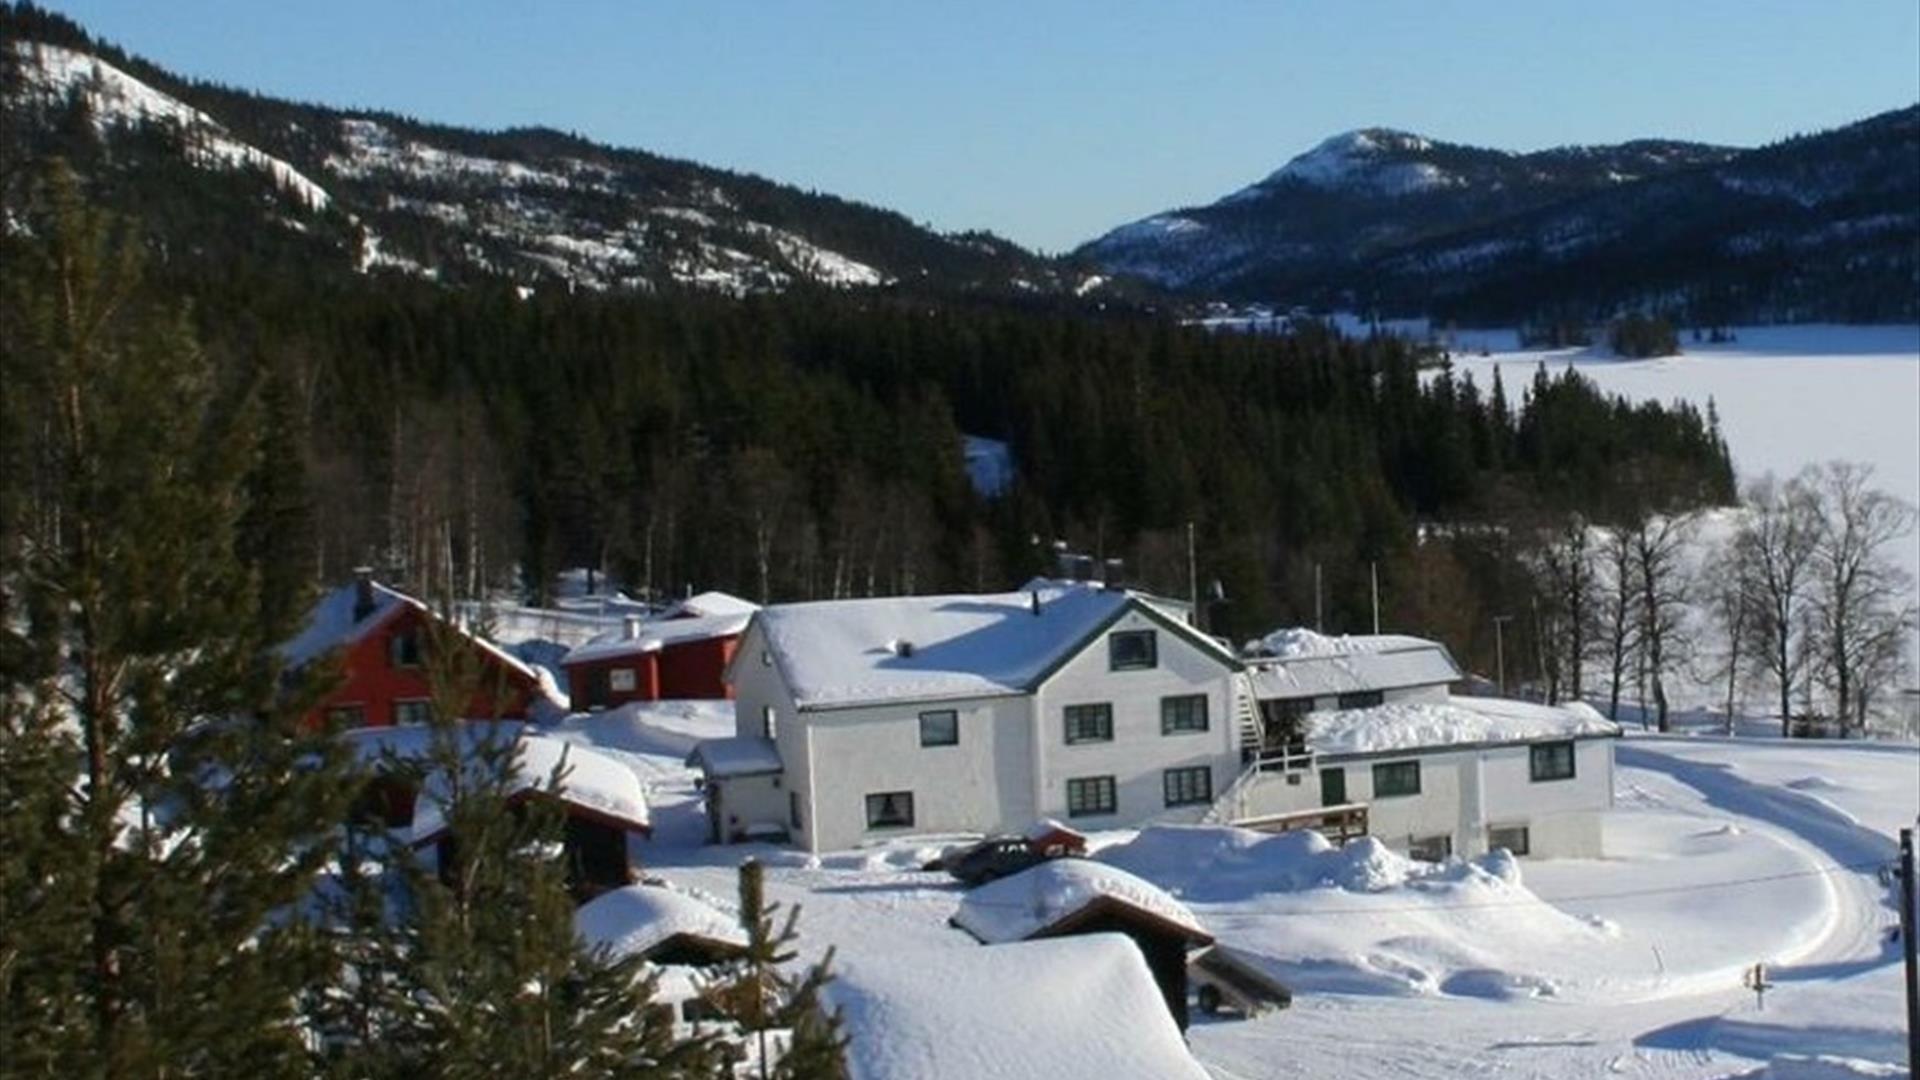 Strand Fjellstue vinterstid